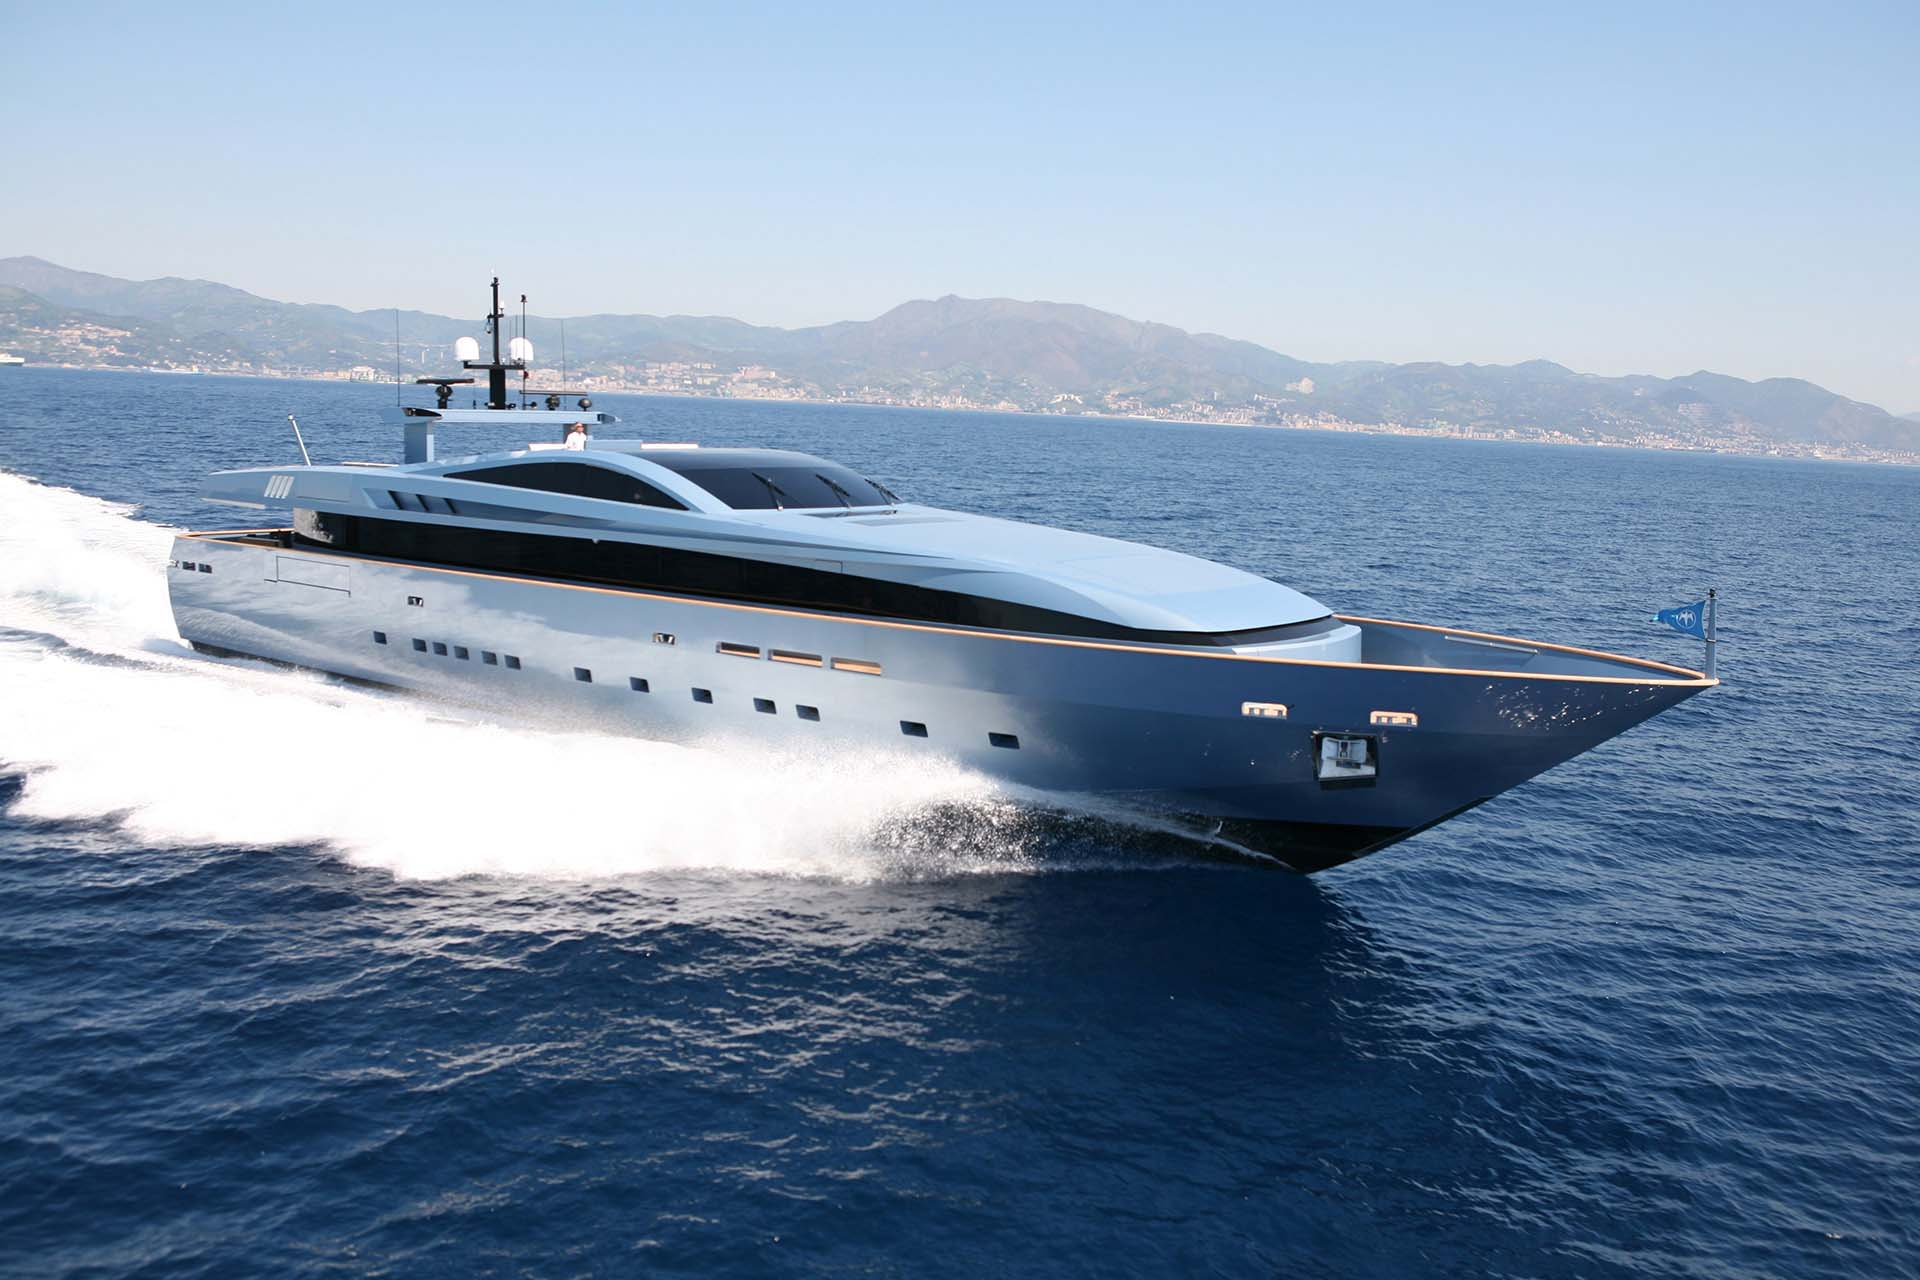 baglietto - TATIANA PER SEMPRE - Paskowsky Yacht Design